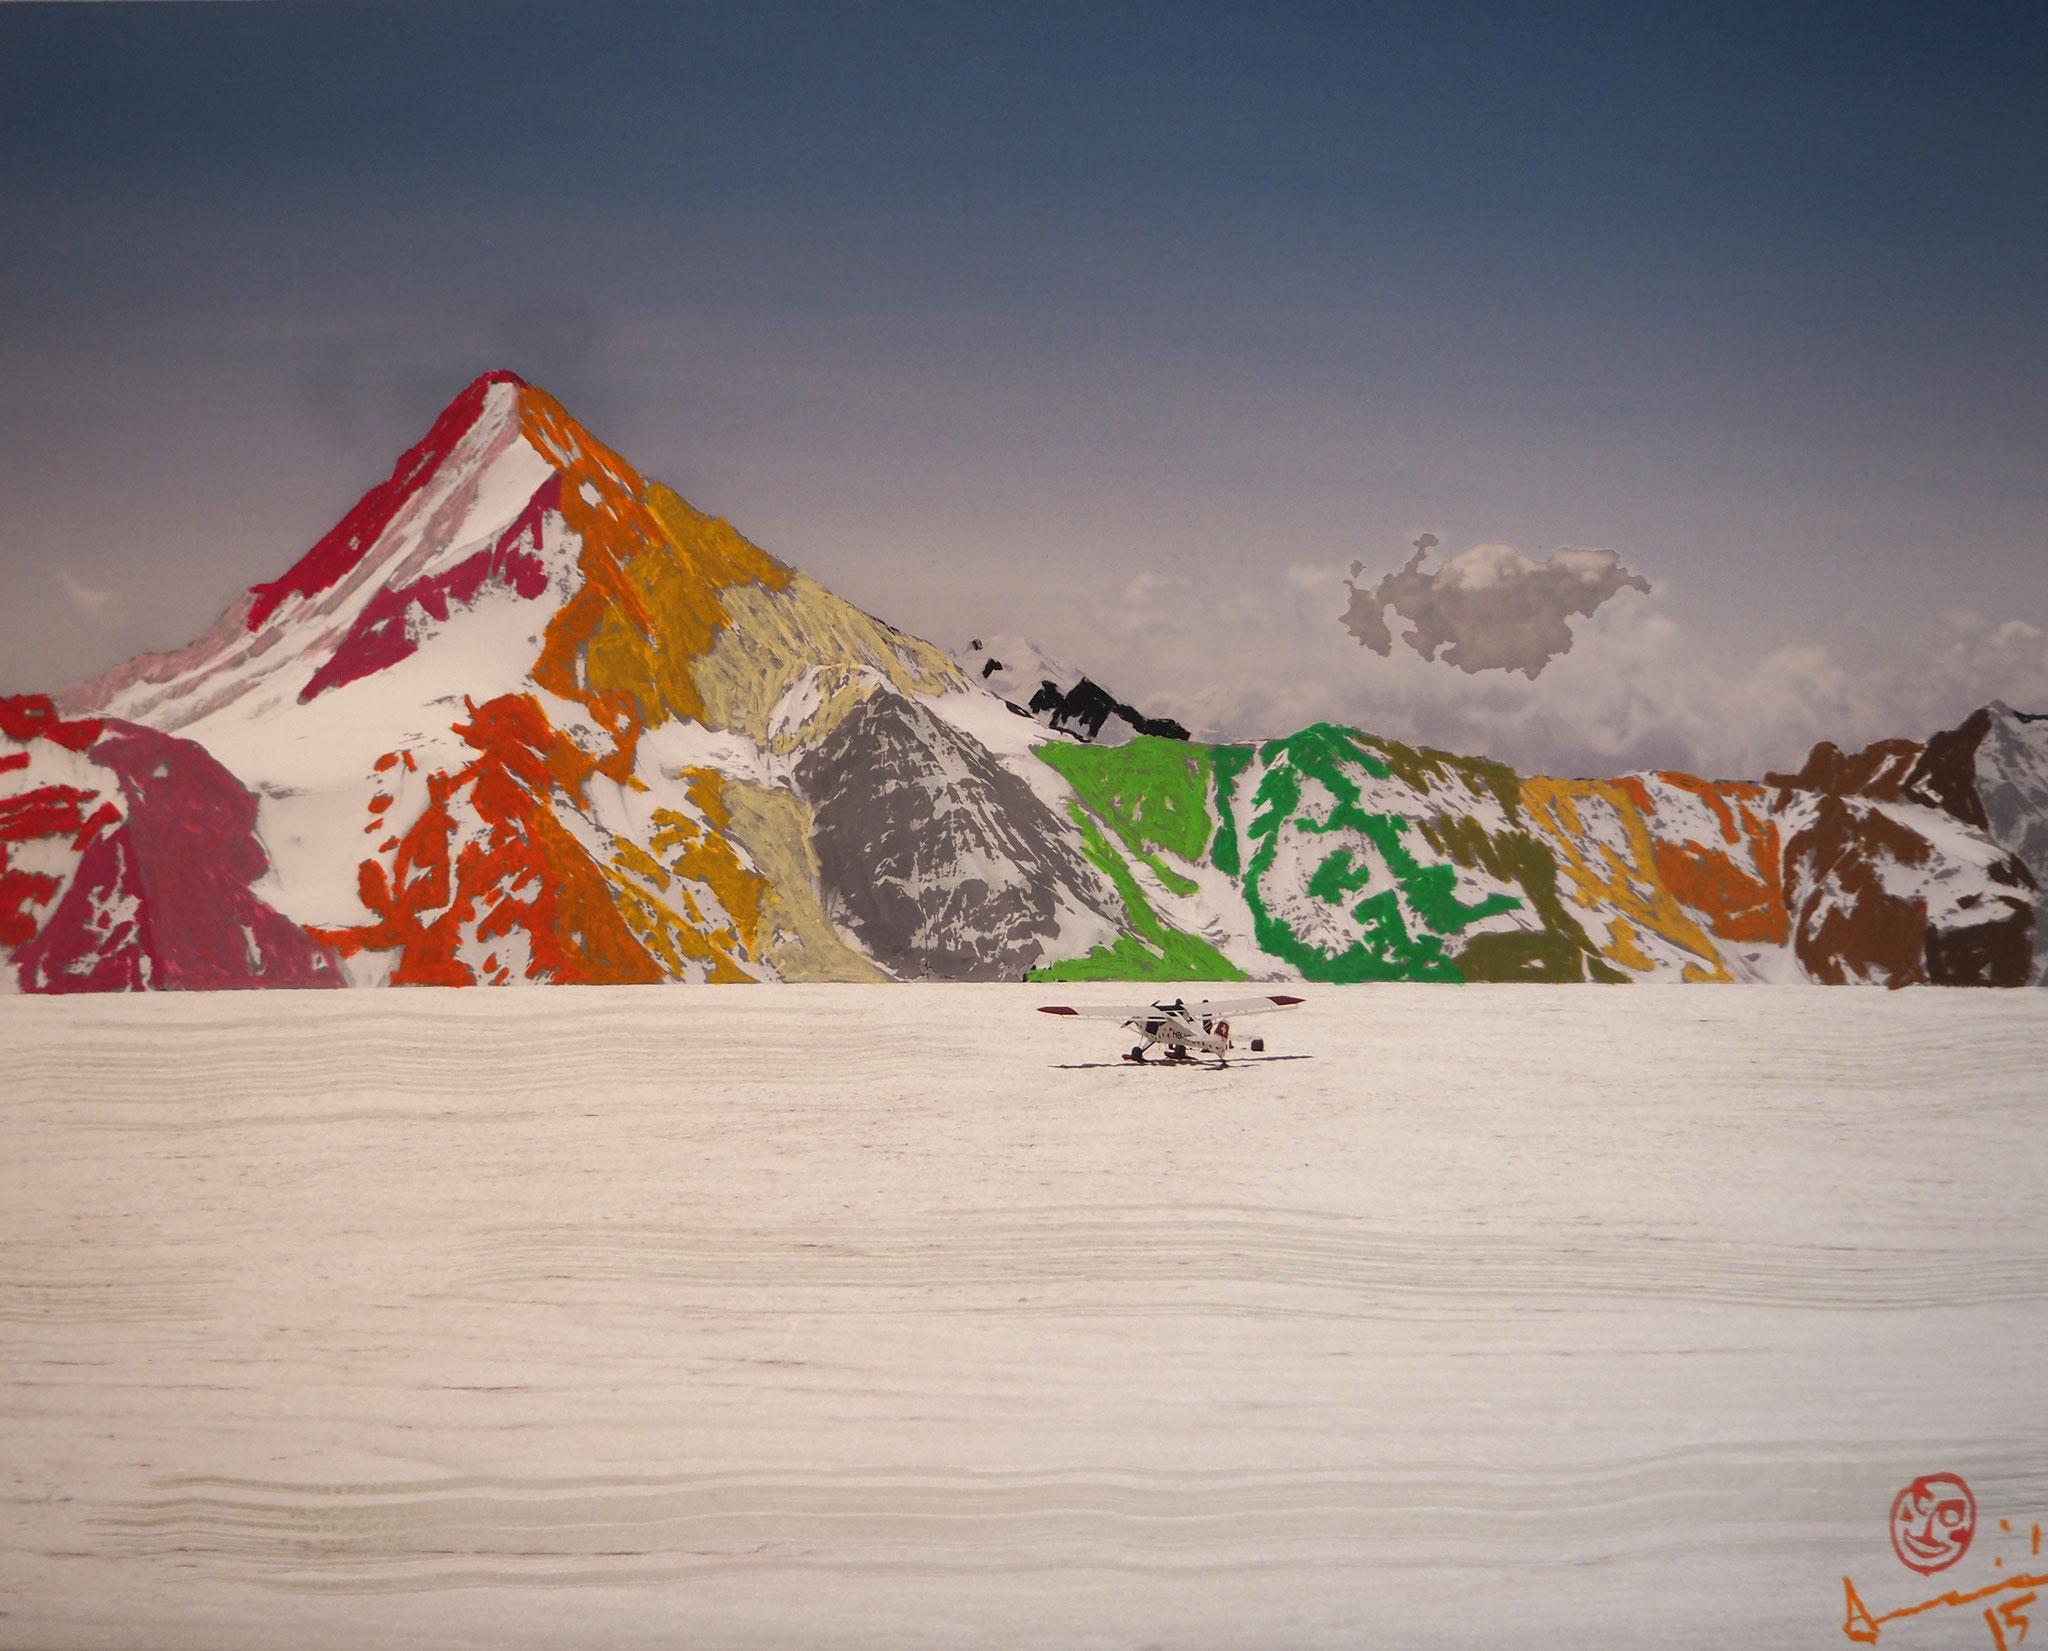 Bielette 100cmx80cm - Blick vom Petersgrat zum Bietschhorn